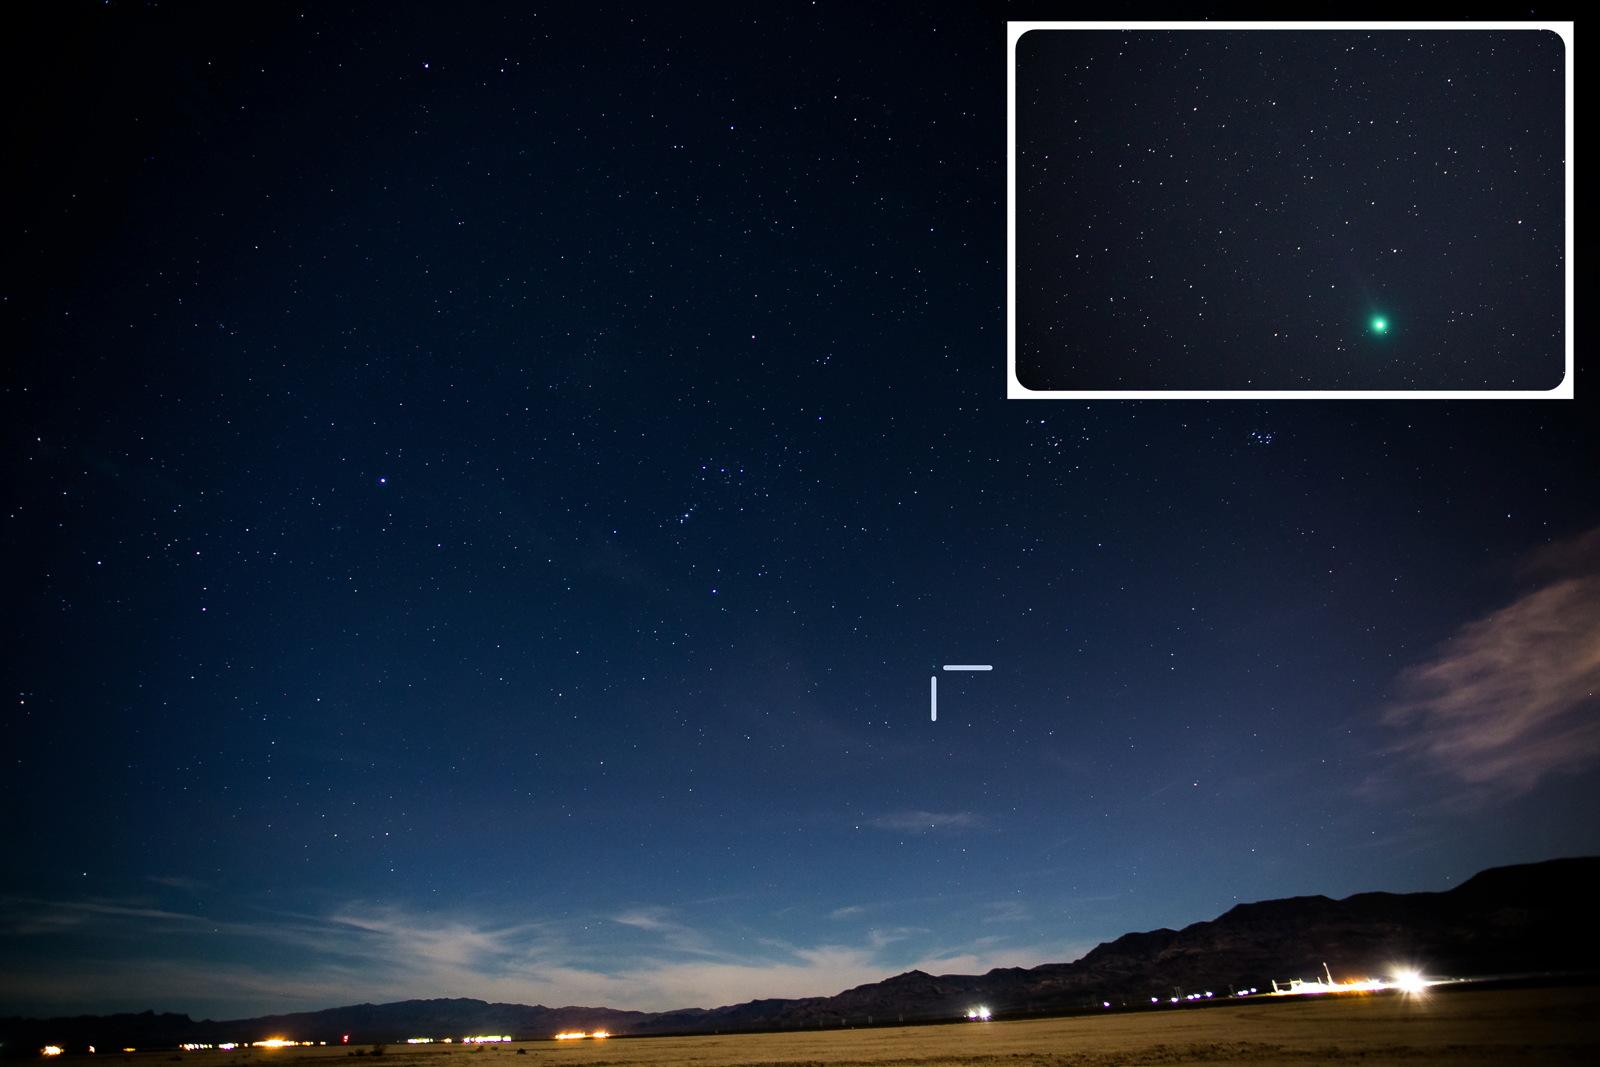 Comet Lovejoy C/2014 Q2 by Leavitt